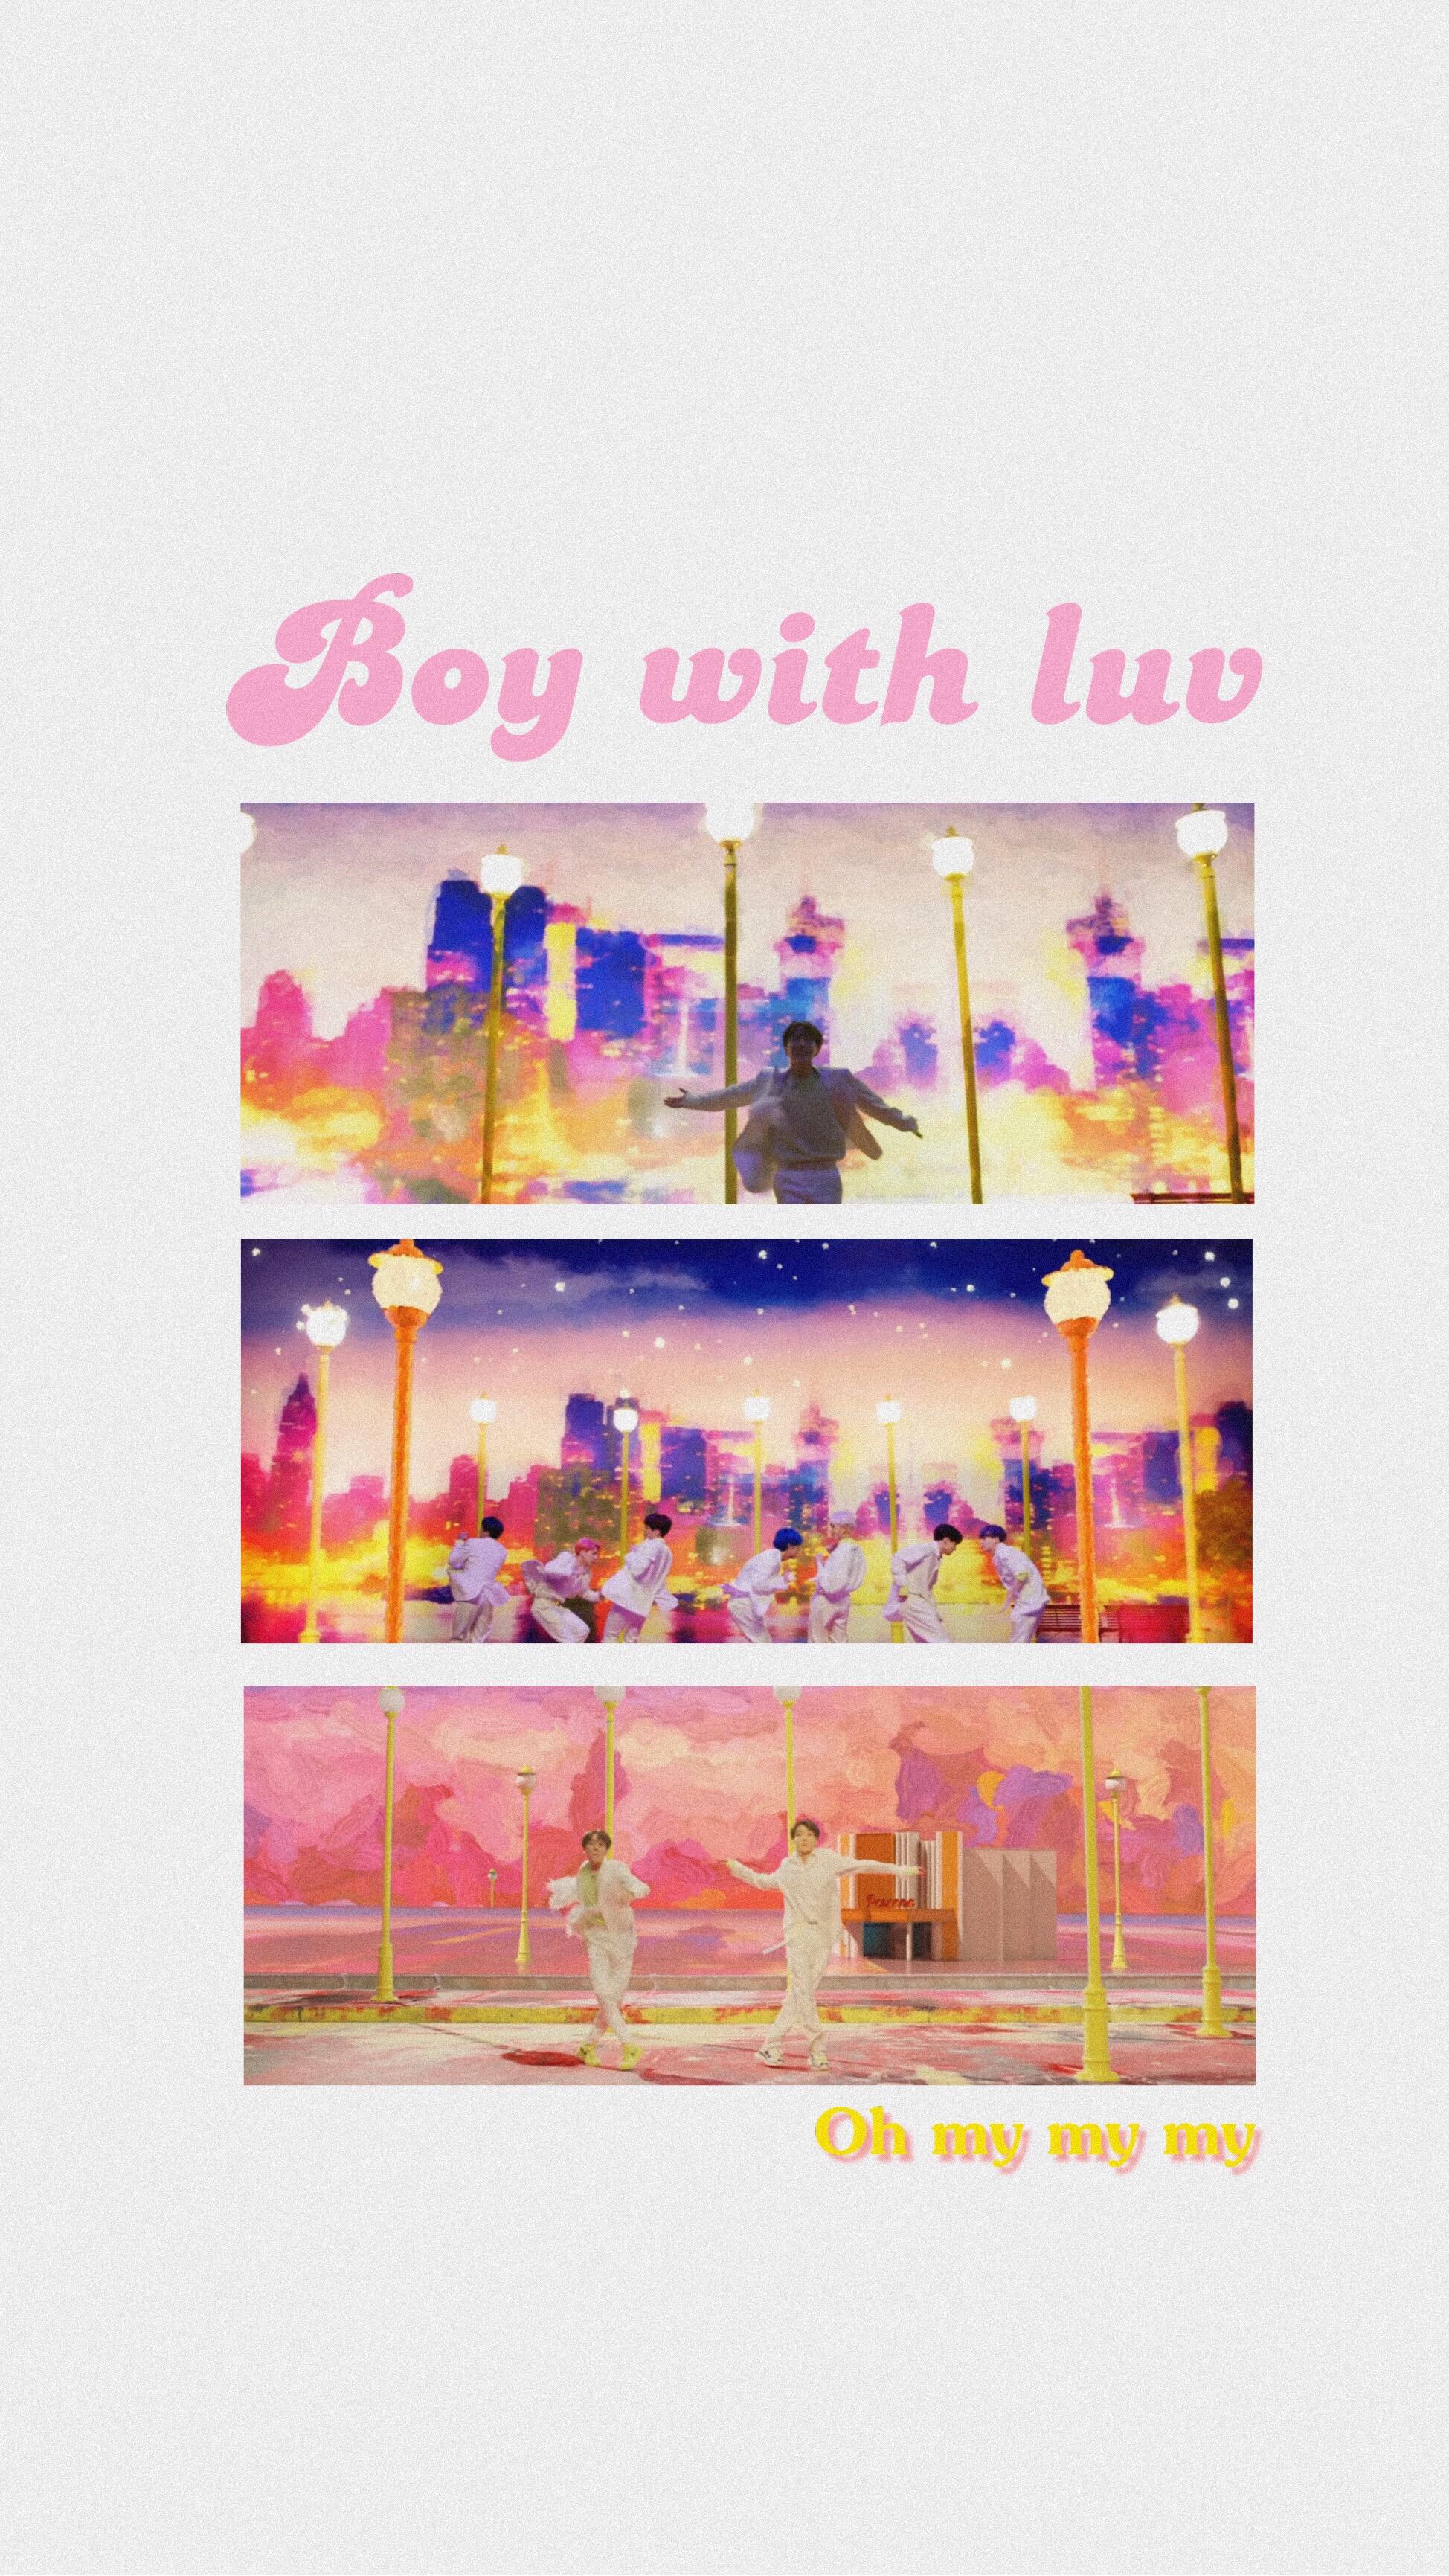 20+ Wallpaper Bts Boy With Luv   Richa Wallpaper